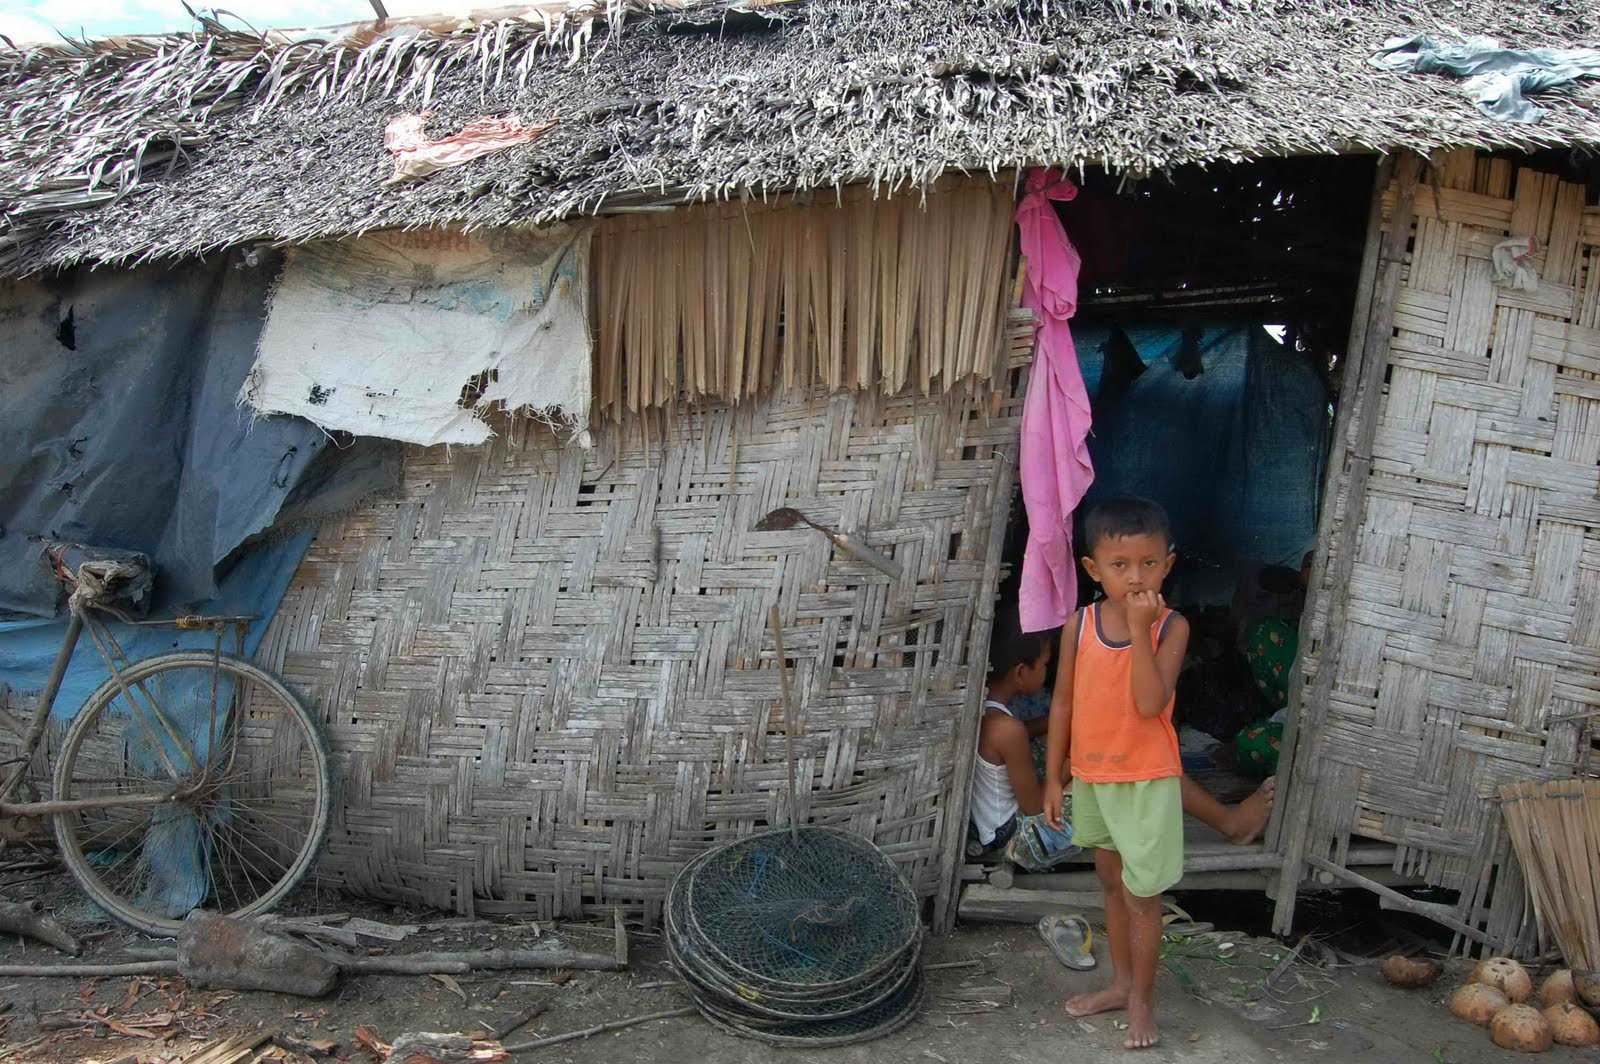 Contoh Kriminalitas Di Indonesia Anakciremai Di Setiap Sudut Kota Jakarta Yang Di Akibatkan Oleh Kegagalan